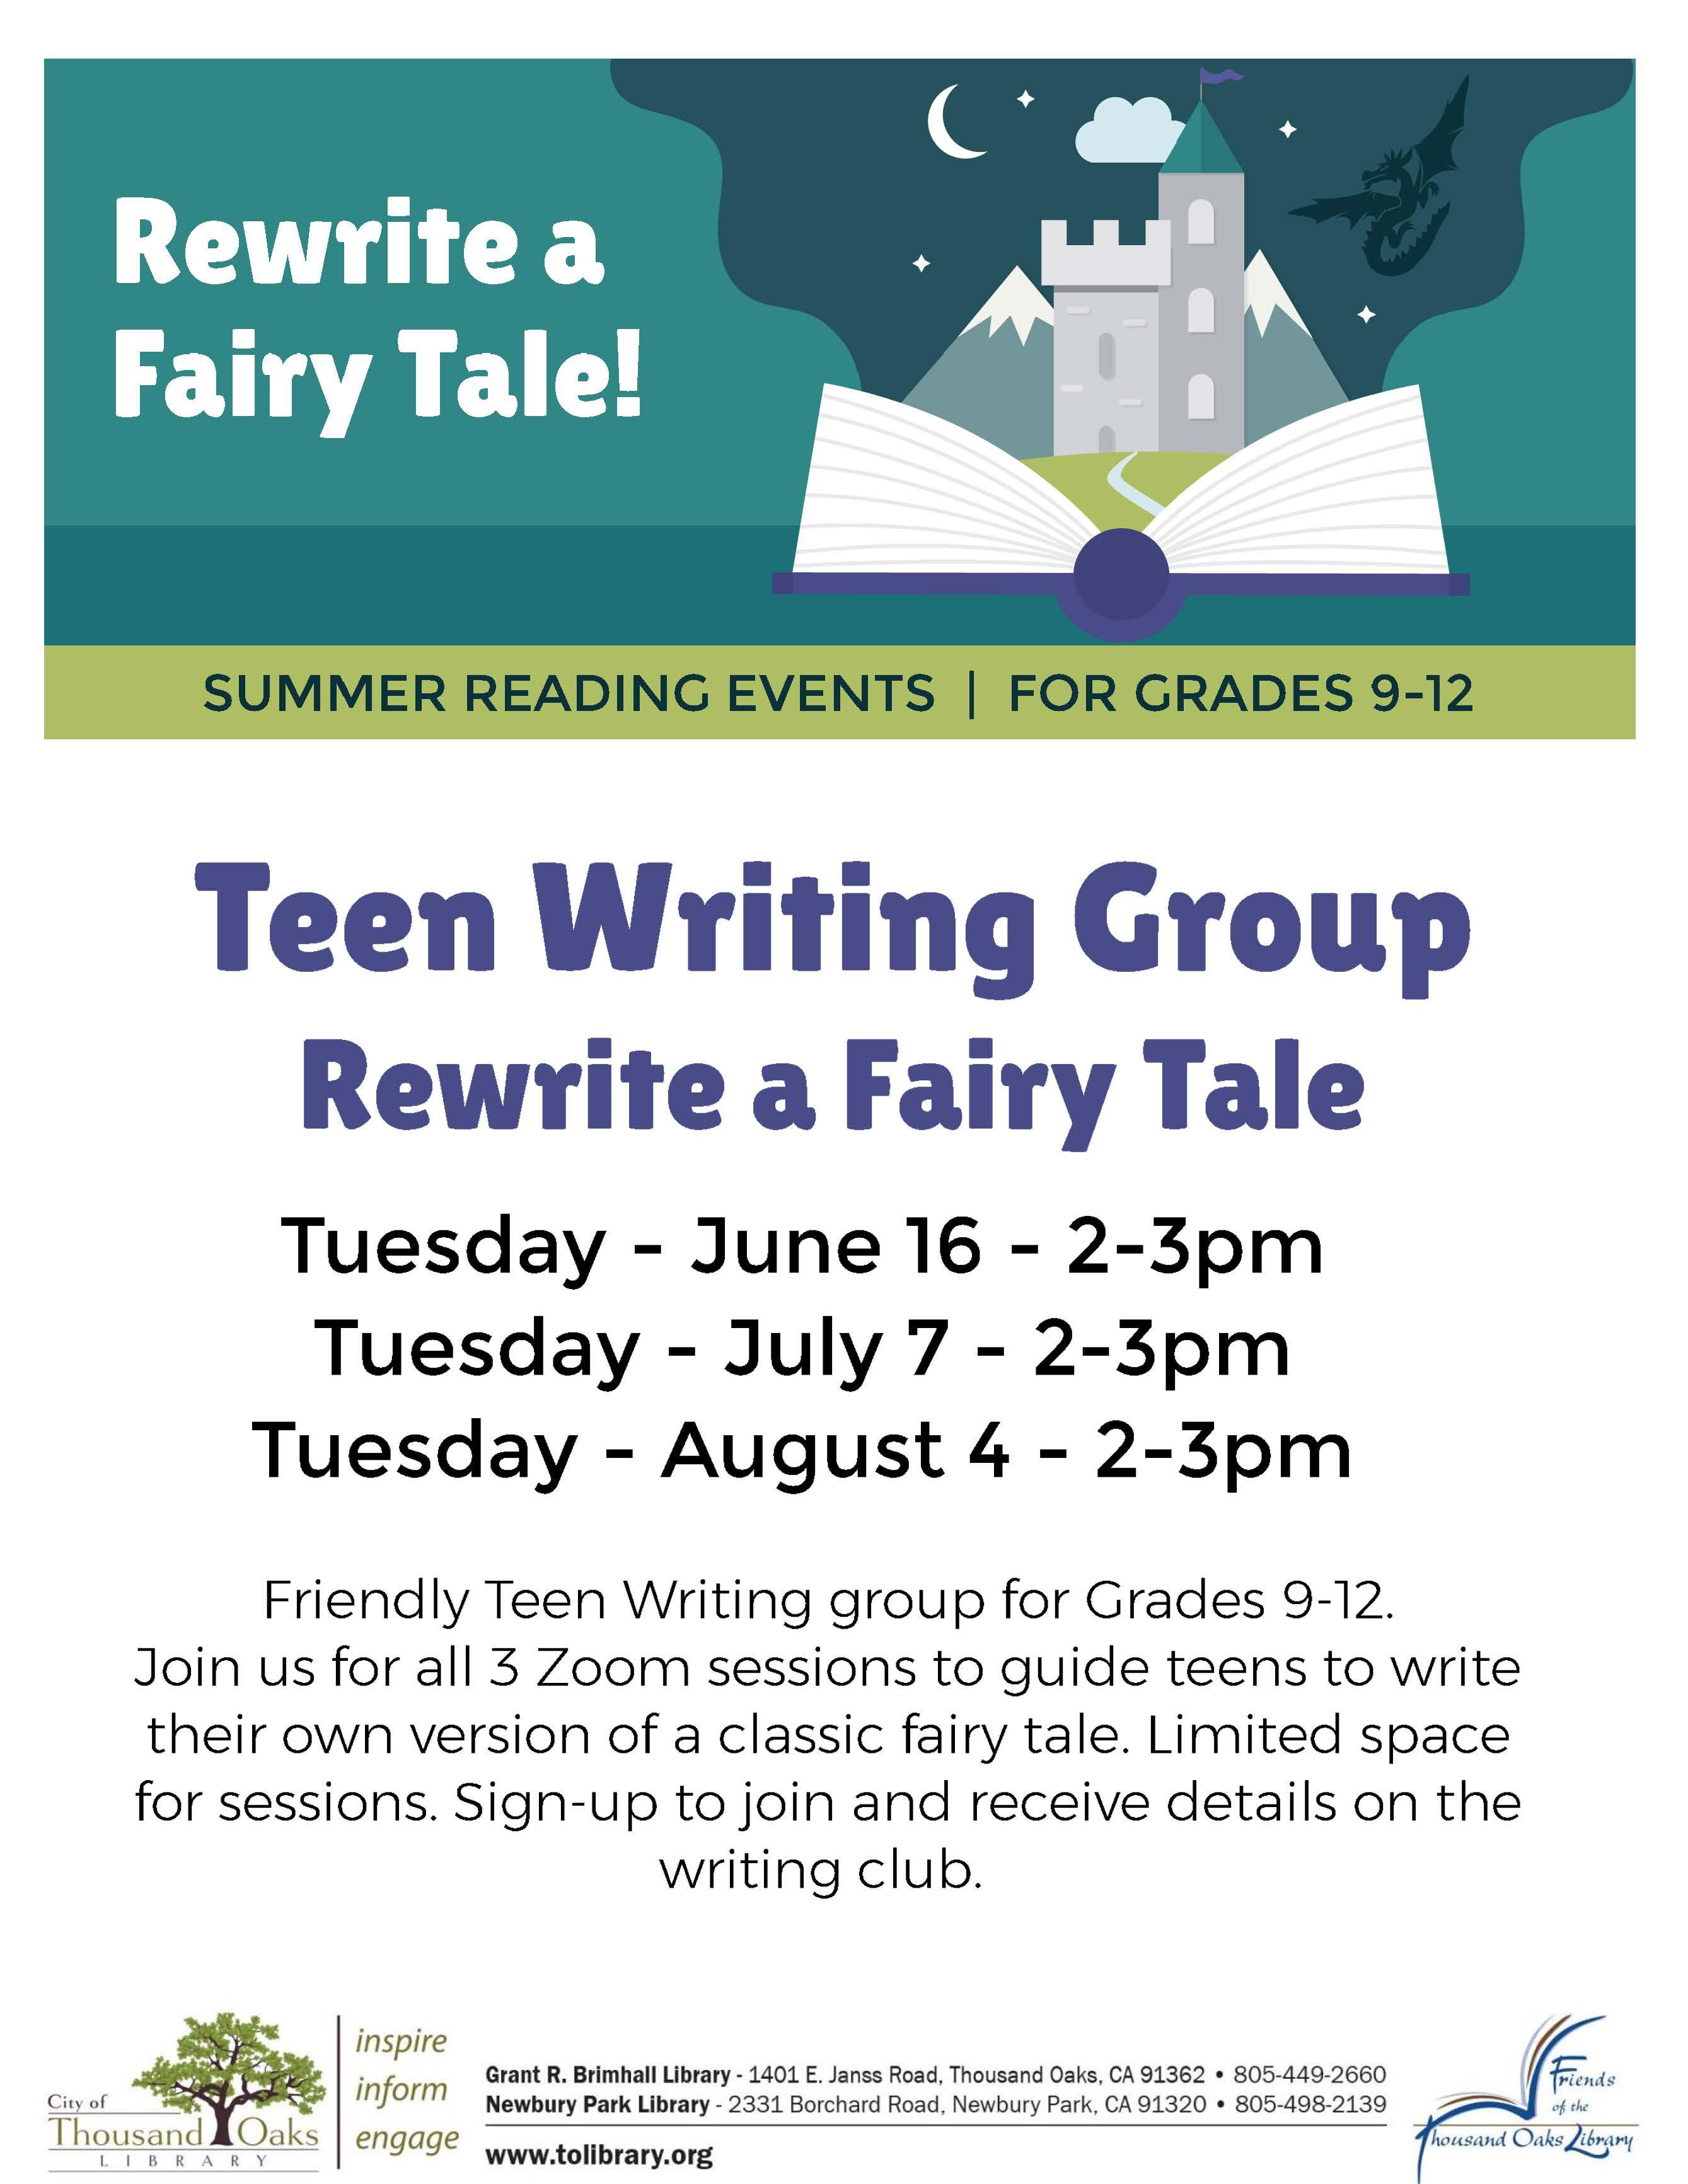 Rewrite a Fairy Tale